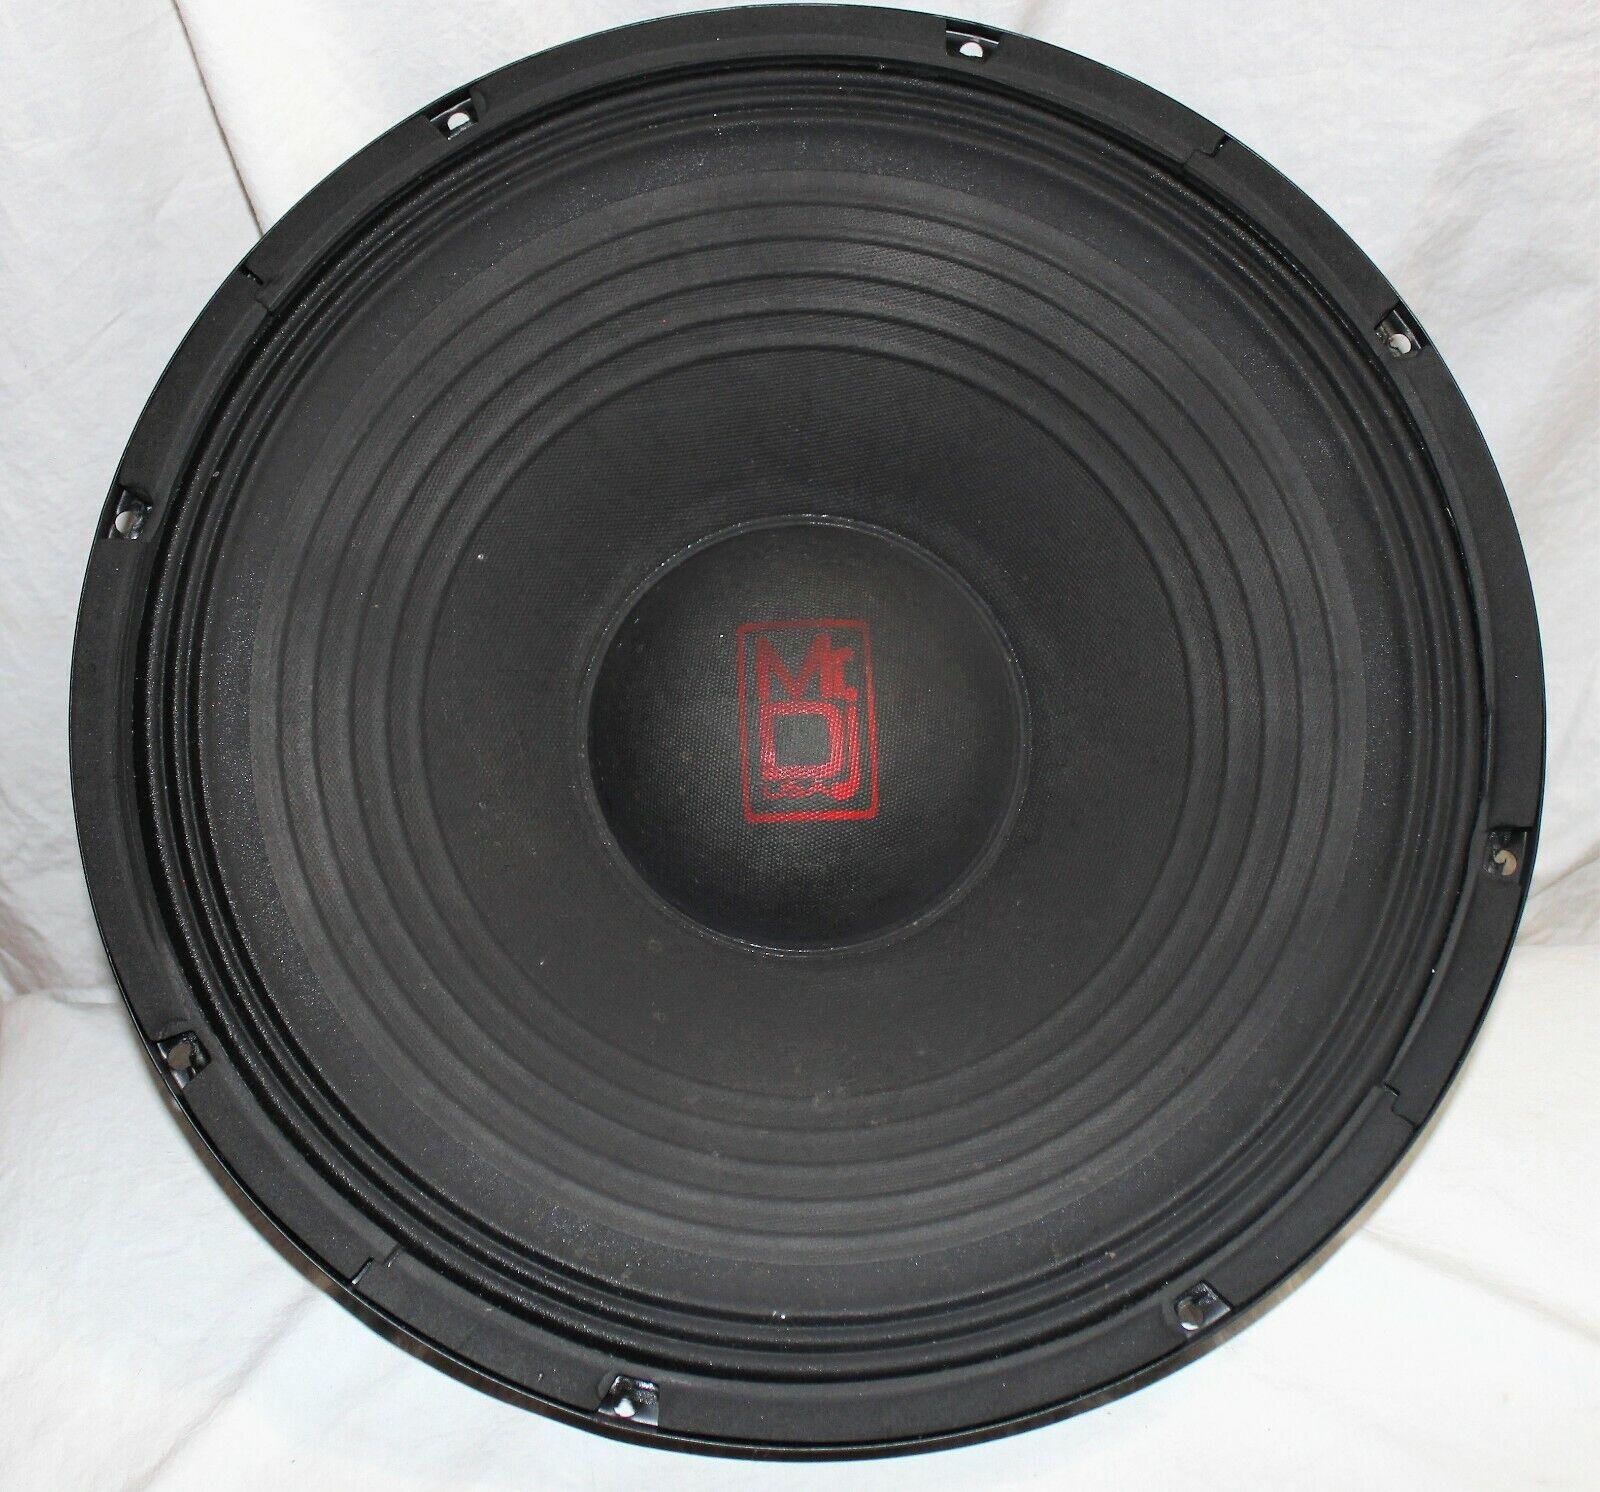 Mr DJ PBX-2600 15  speaker driver tested great shape